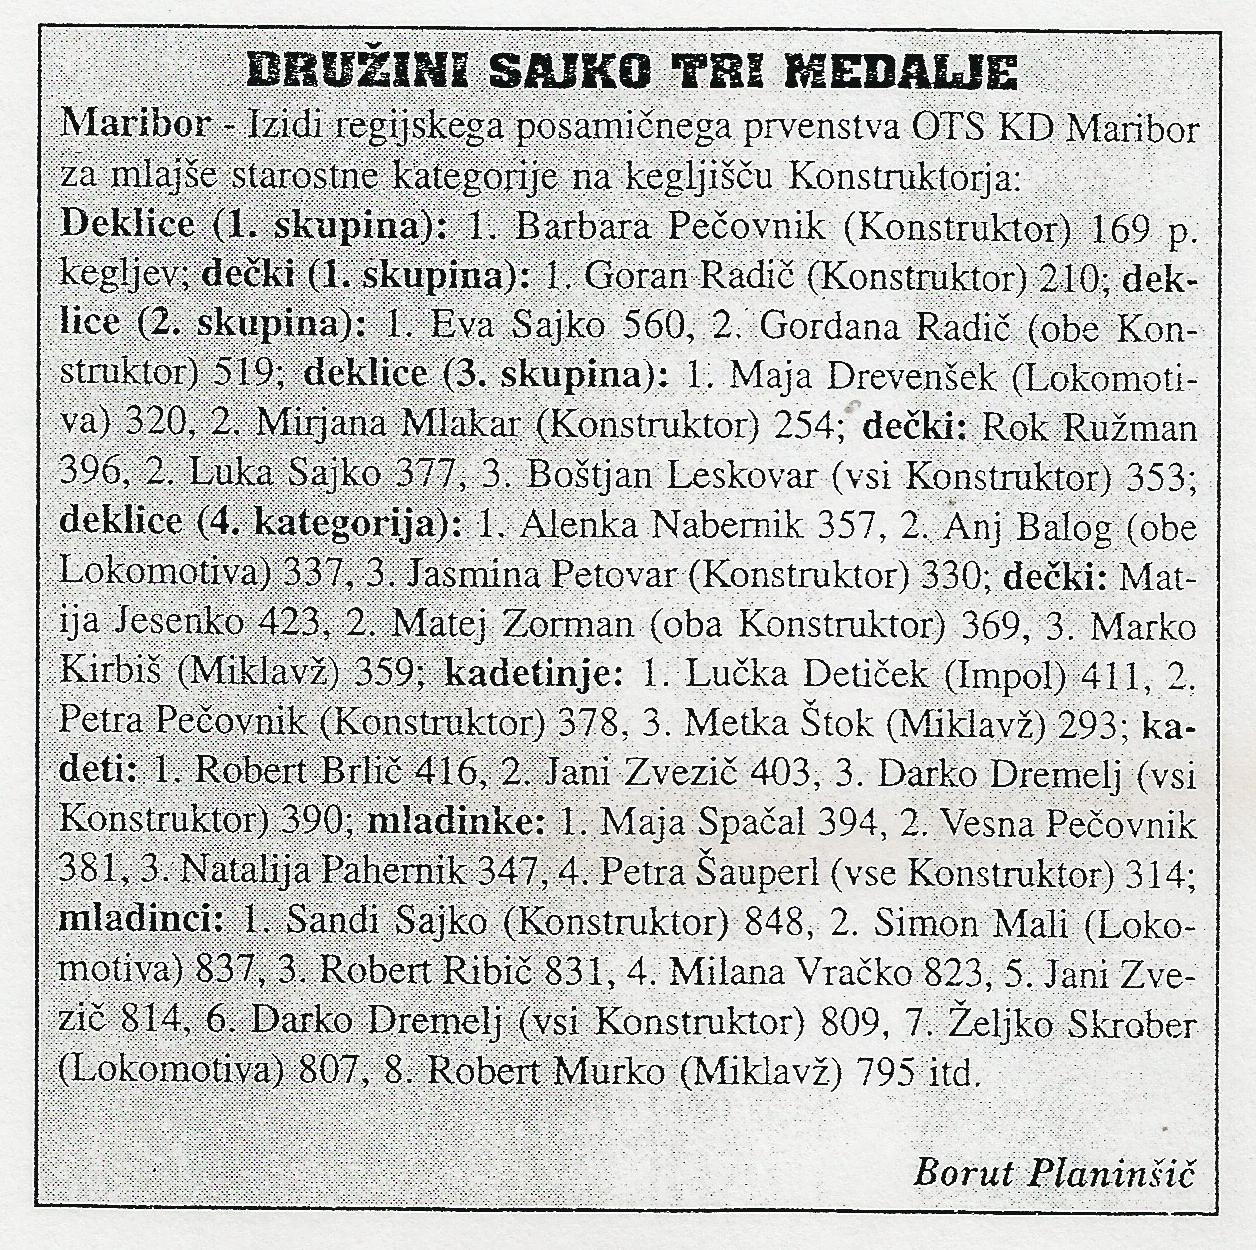 OKZ, Ekipa, 1996